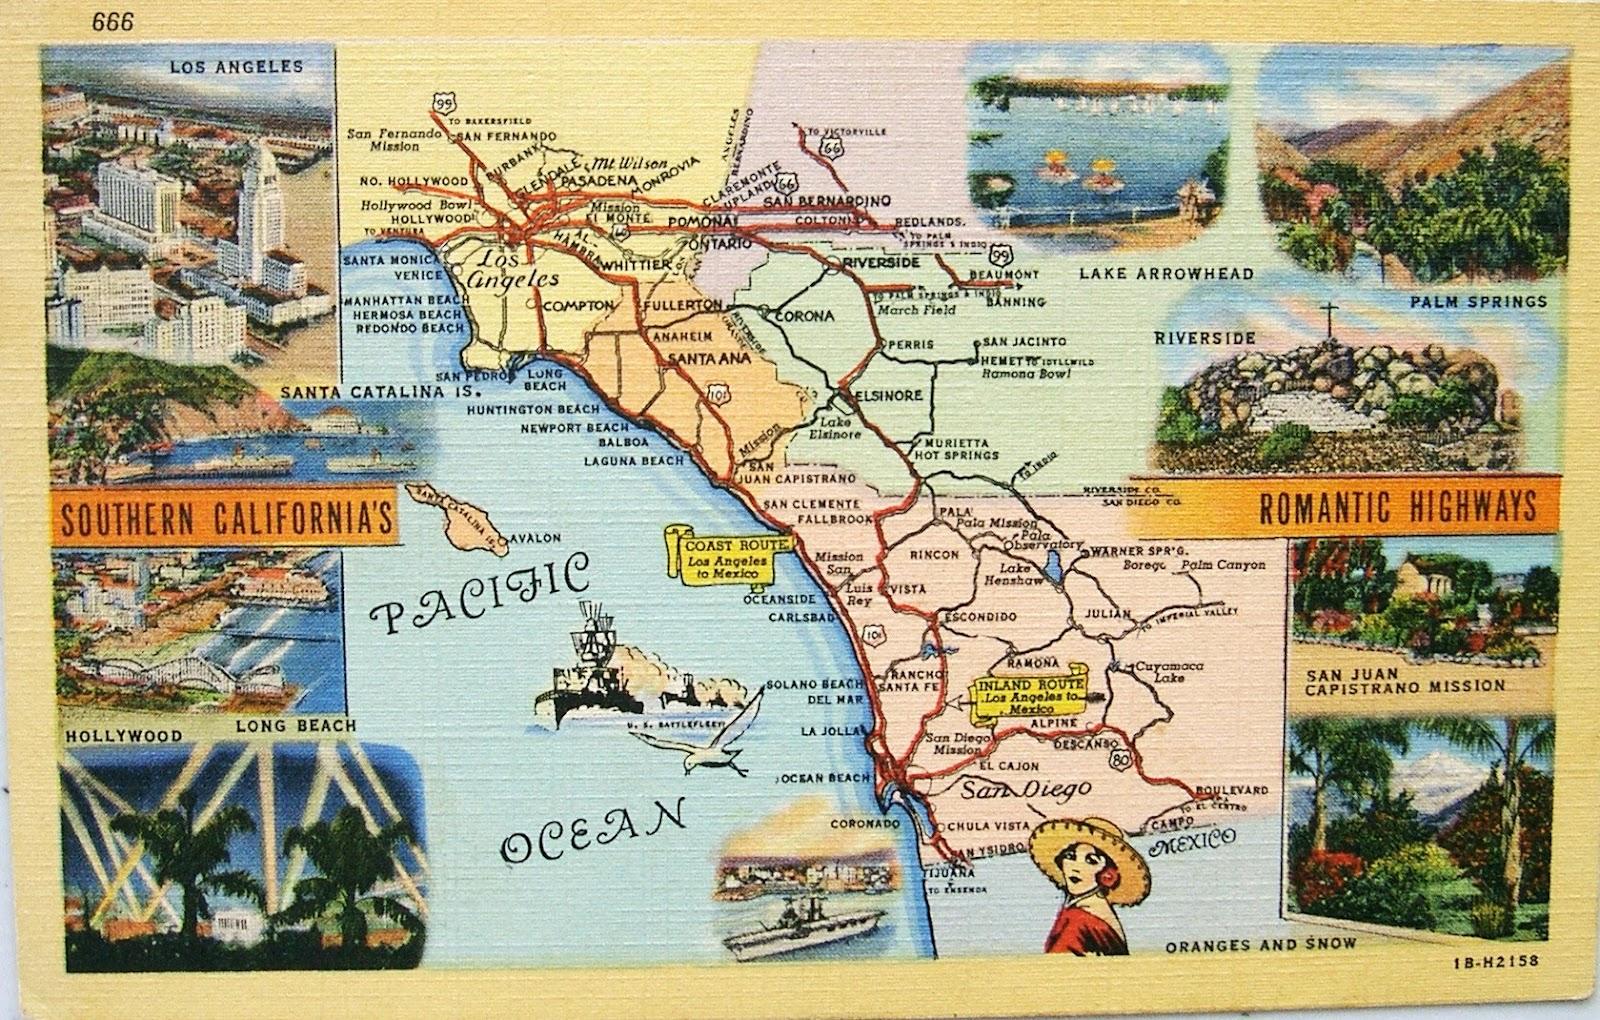 Postcardiva Postcard Blog Vintage US MAP Postcards - Los angeles map vintage